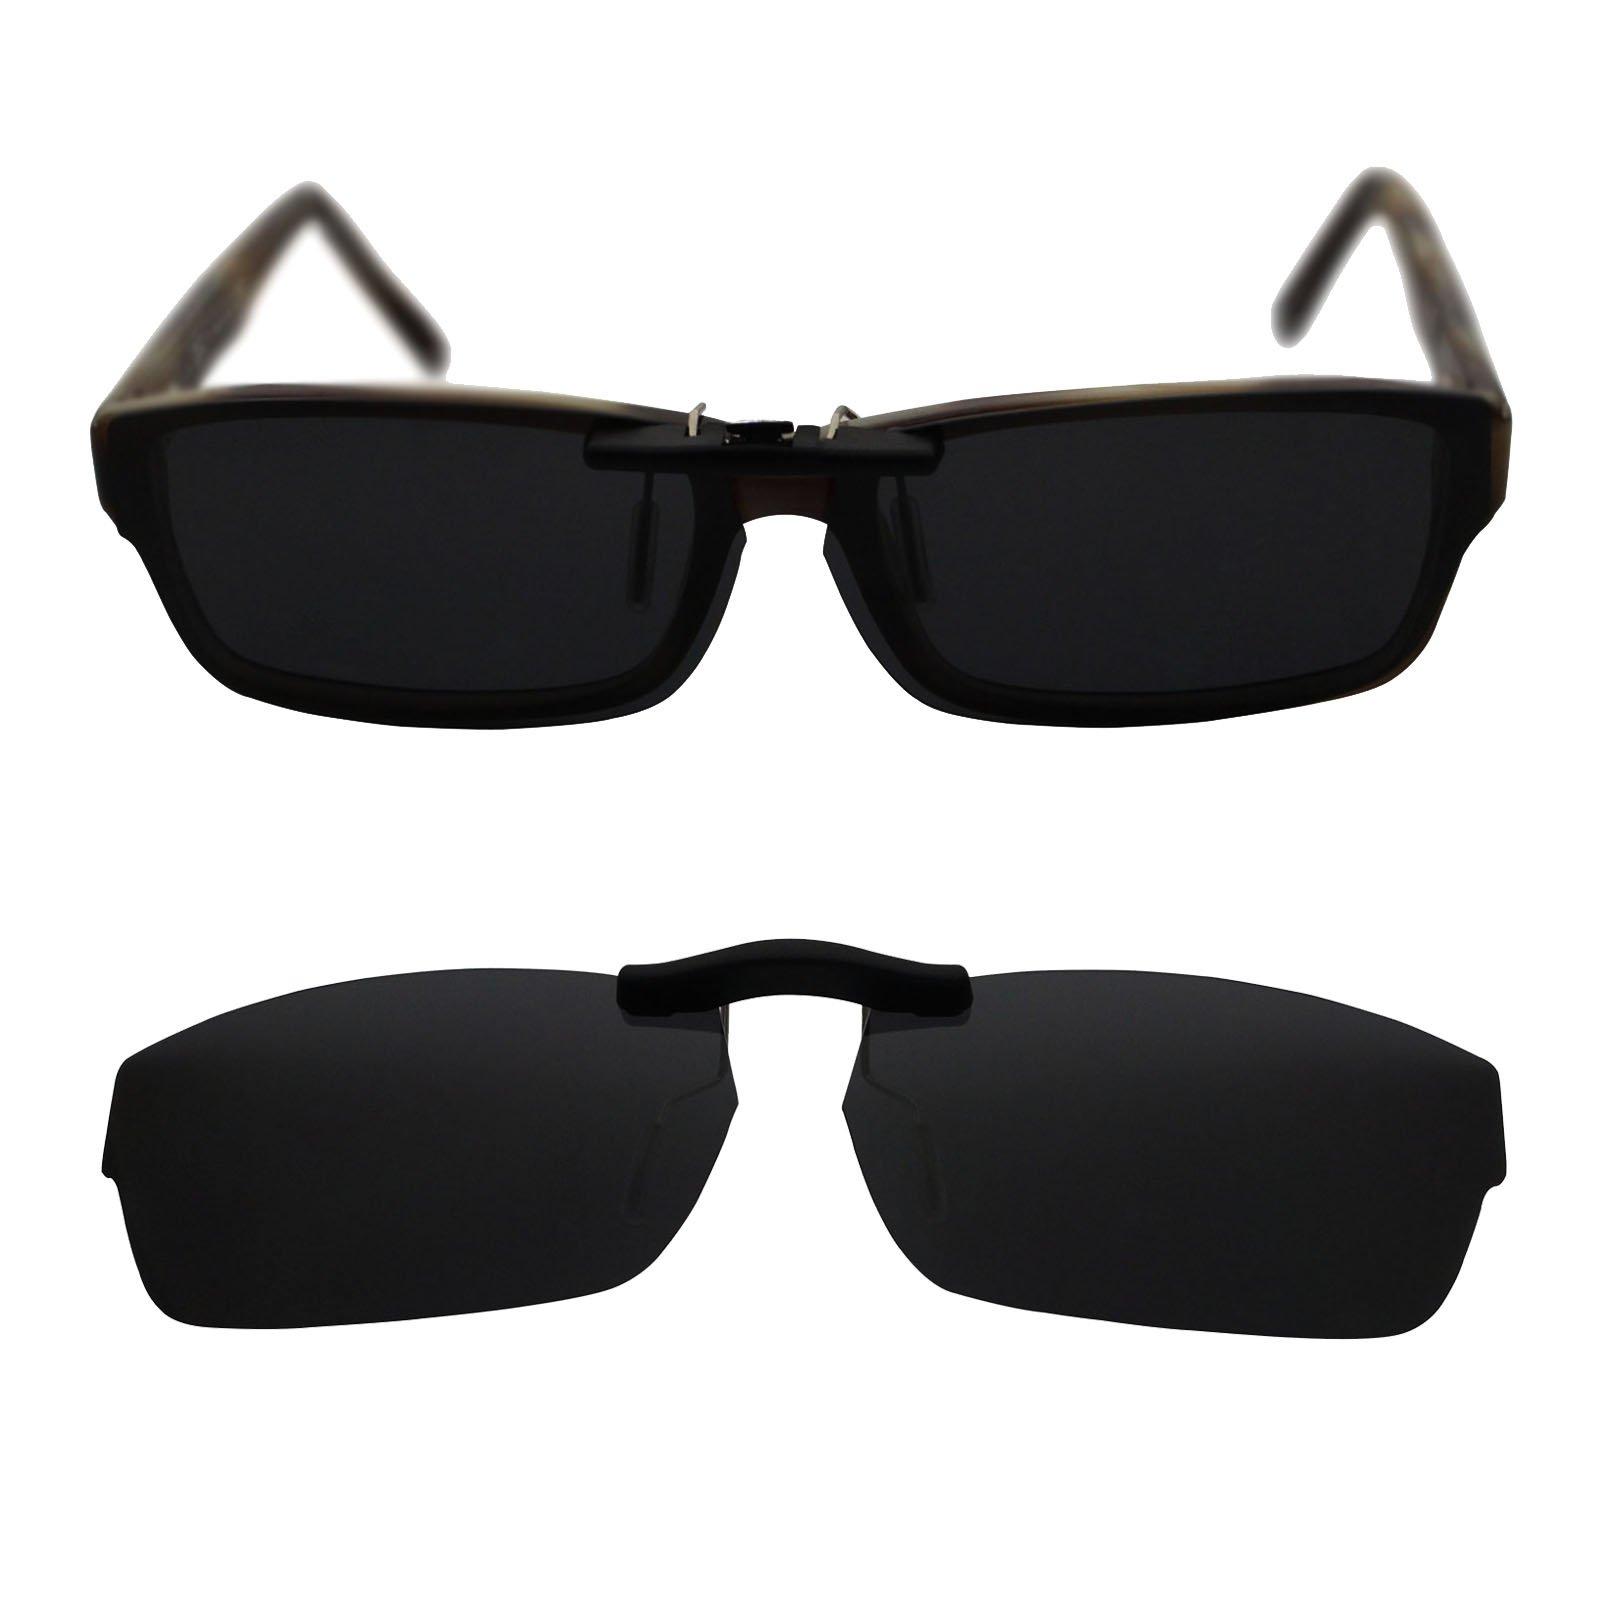 Custom Polarized Clip On Sunglasses for RAY-BAN RB5169 (54mm) 54-16-140 (Black)